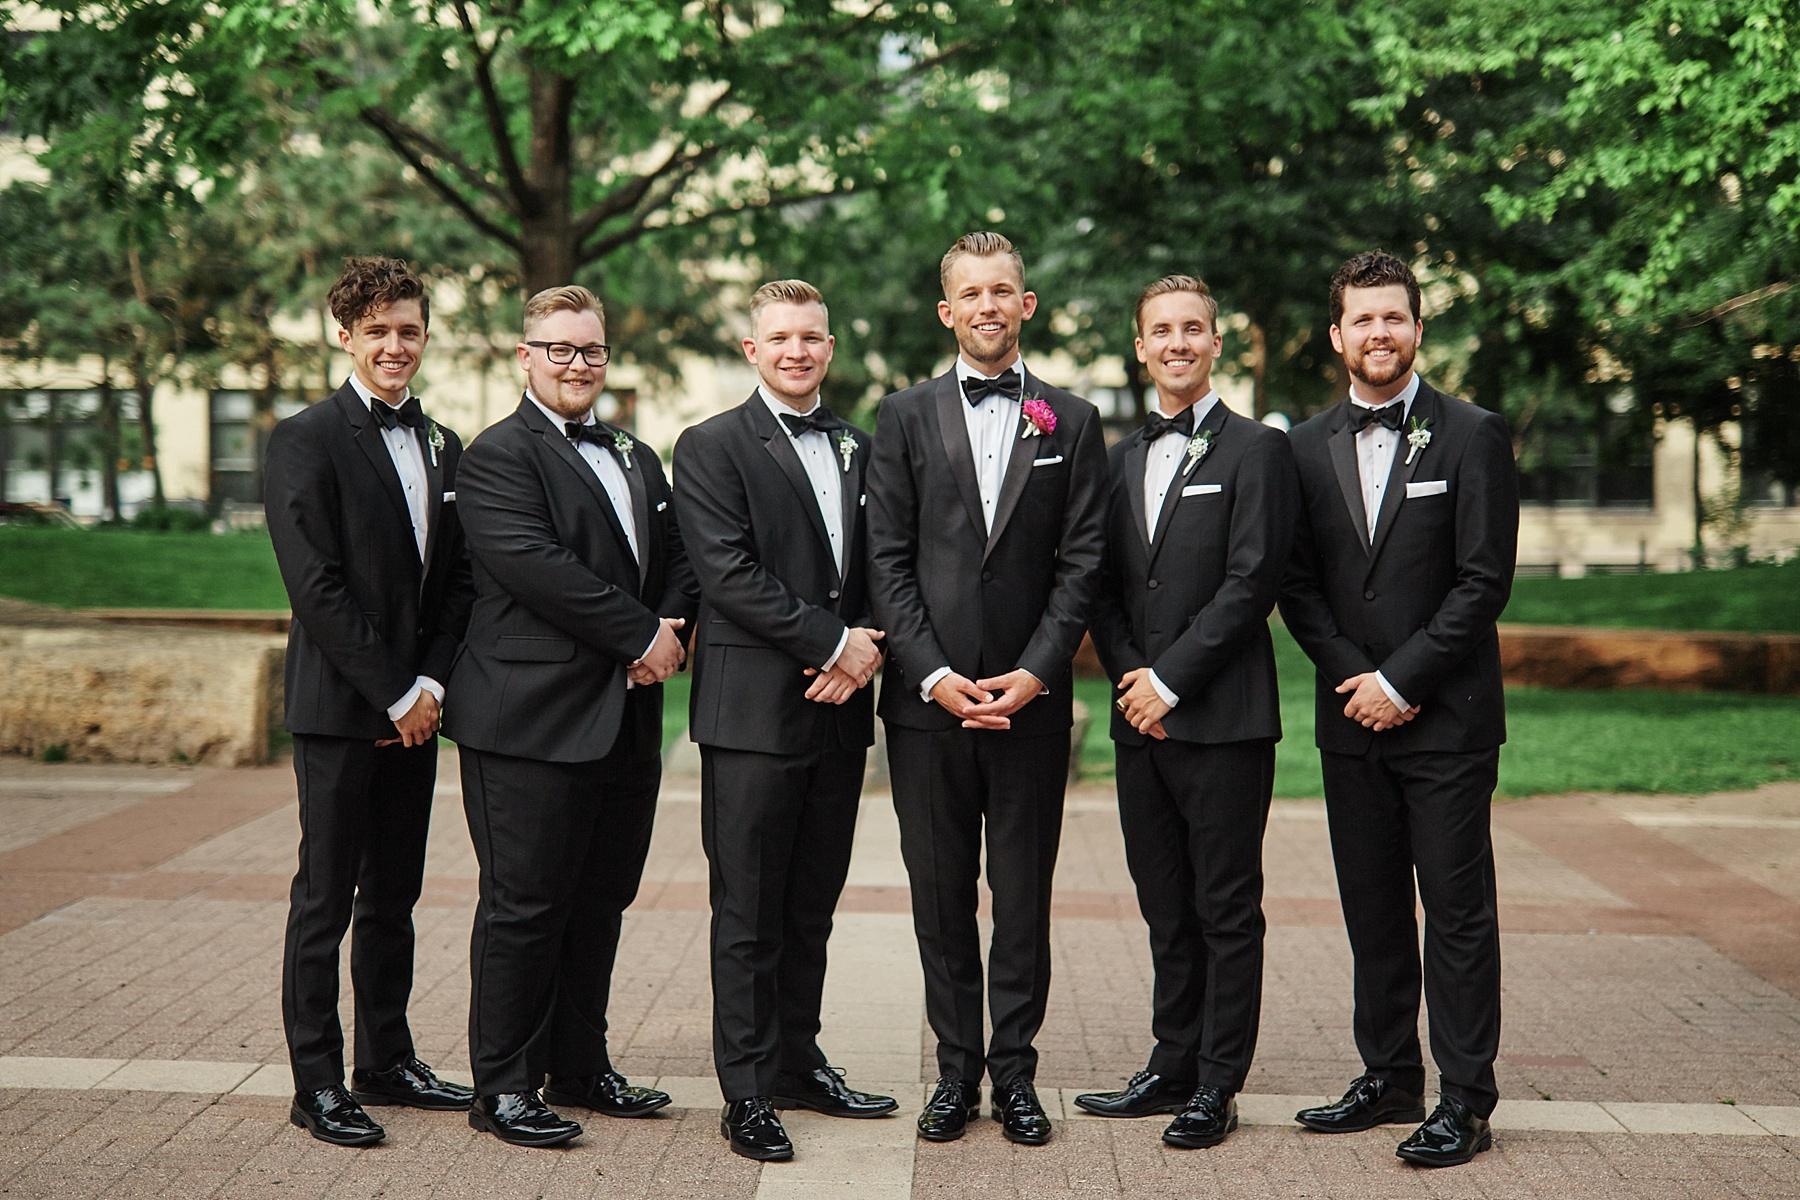 ABULAE-Wedding-Saint-paul-MN-Josh-Sofia-Wedding-Mears-Park_0790.jpg